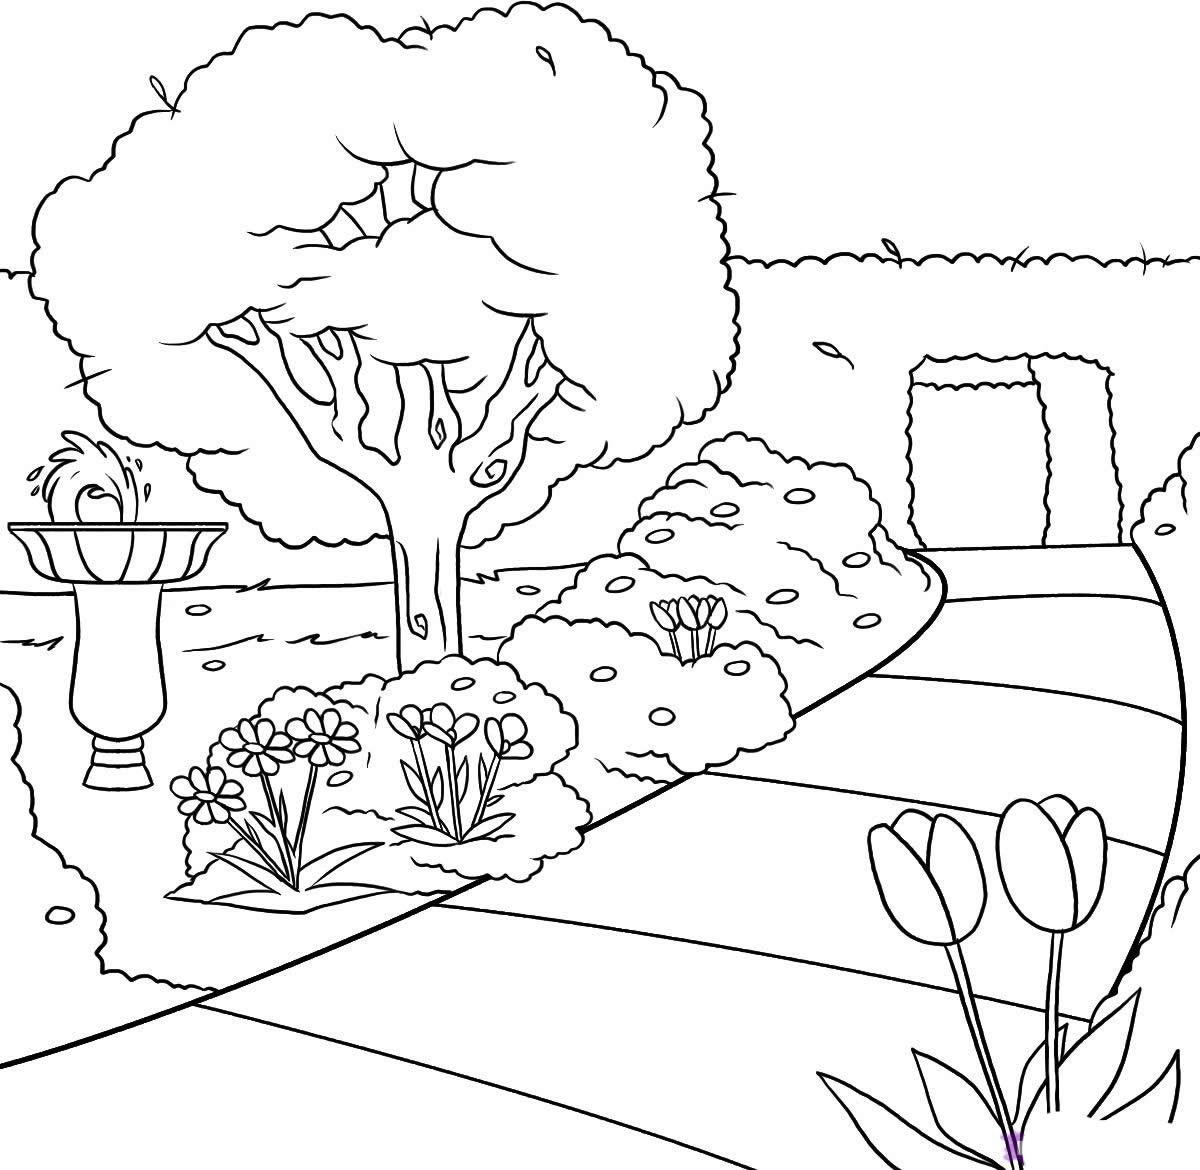 Dibujo de parque para colorear for Como iluminar un parque